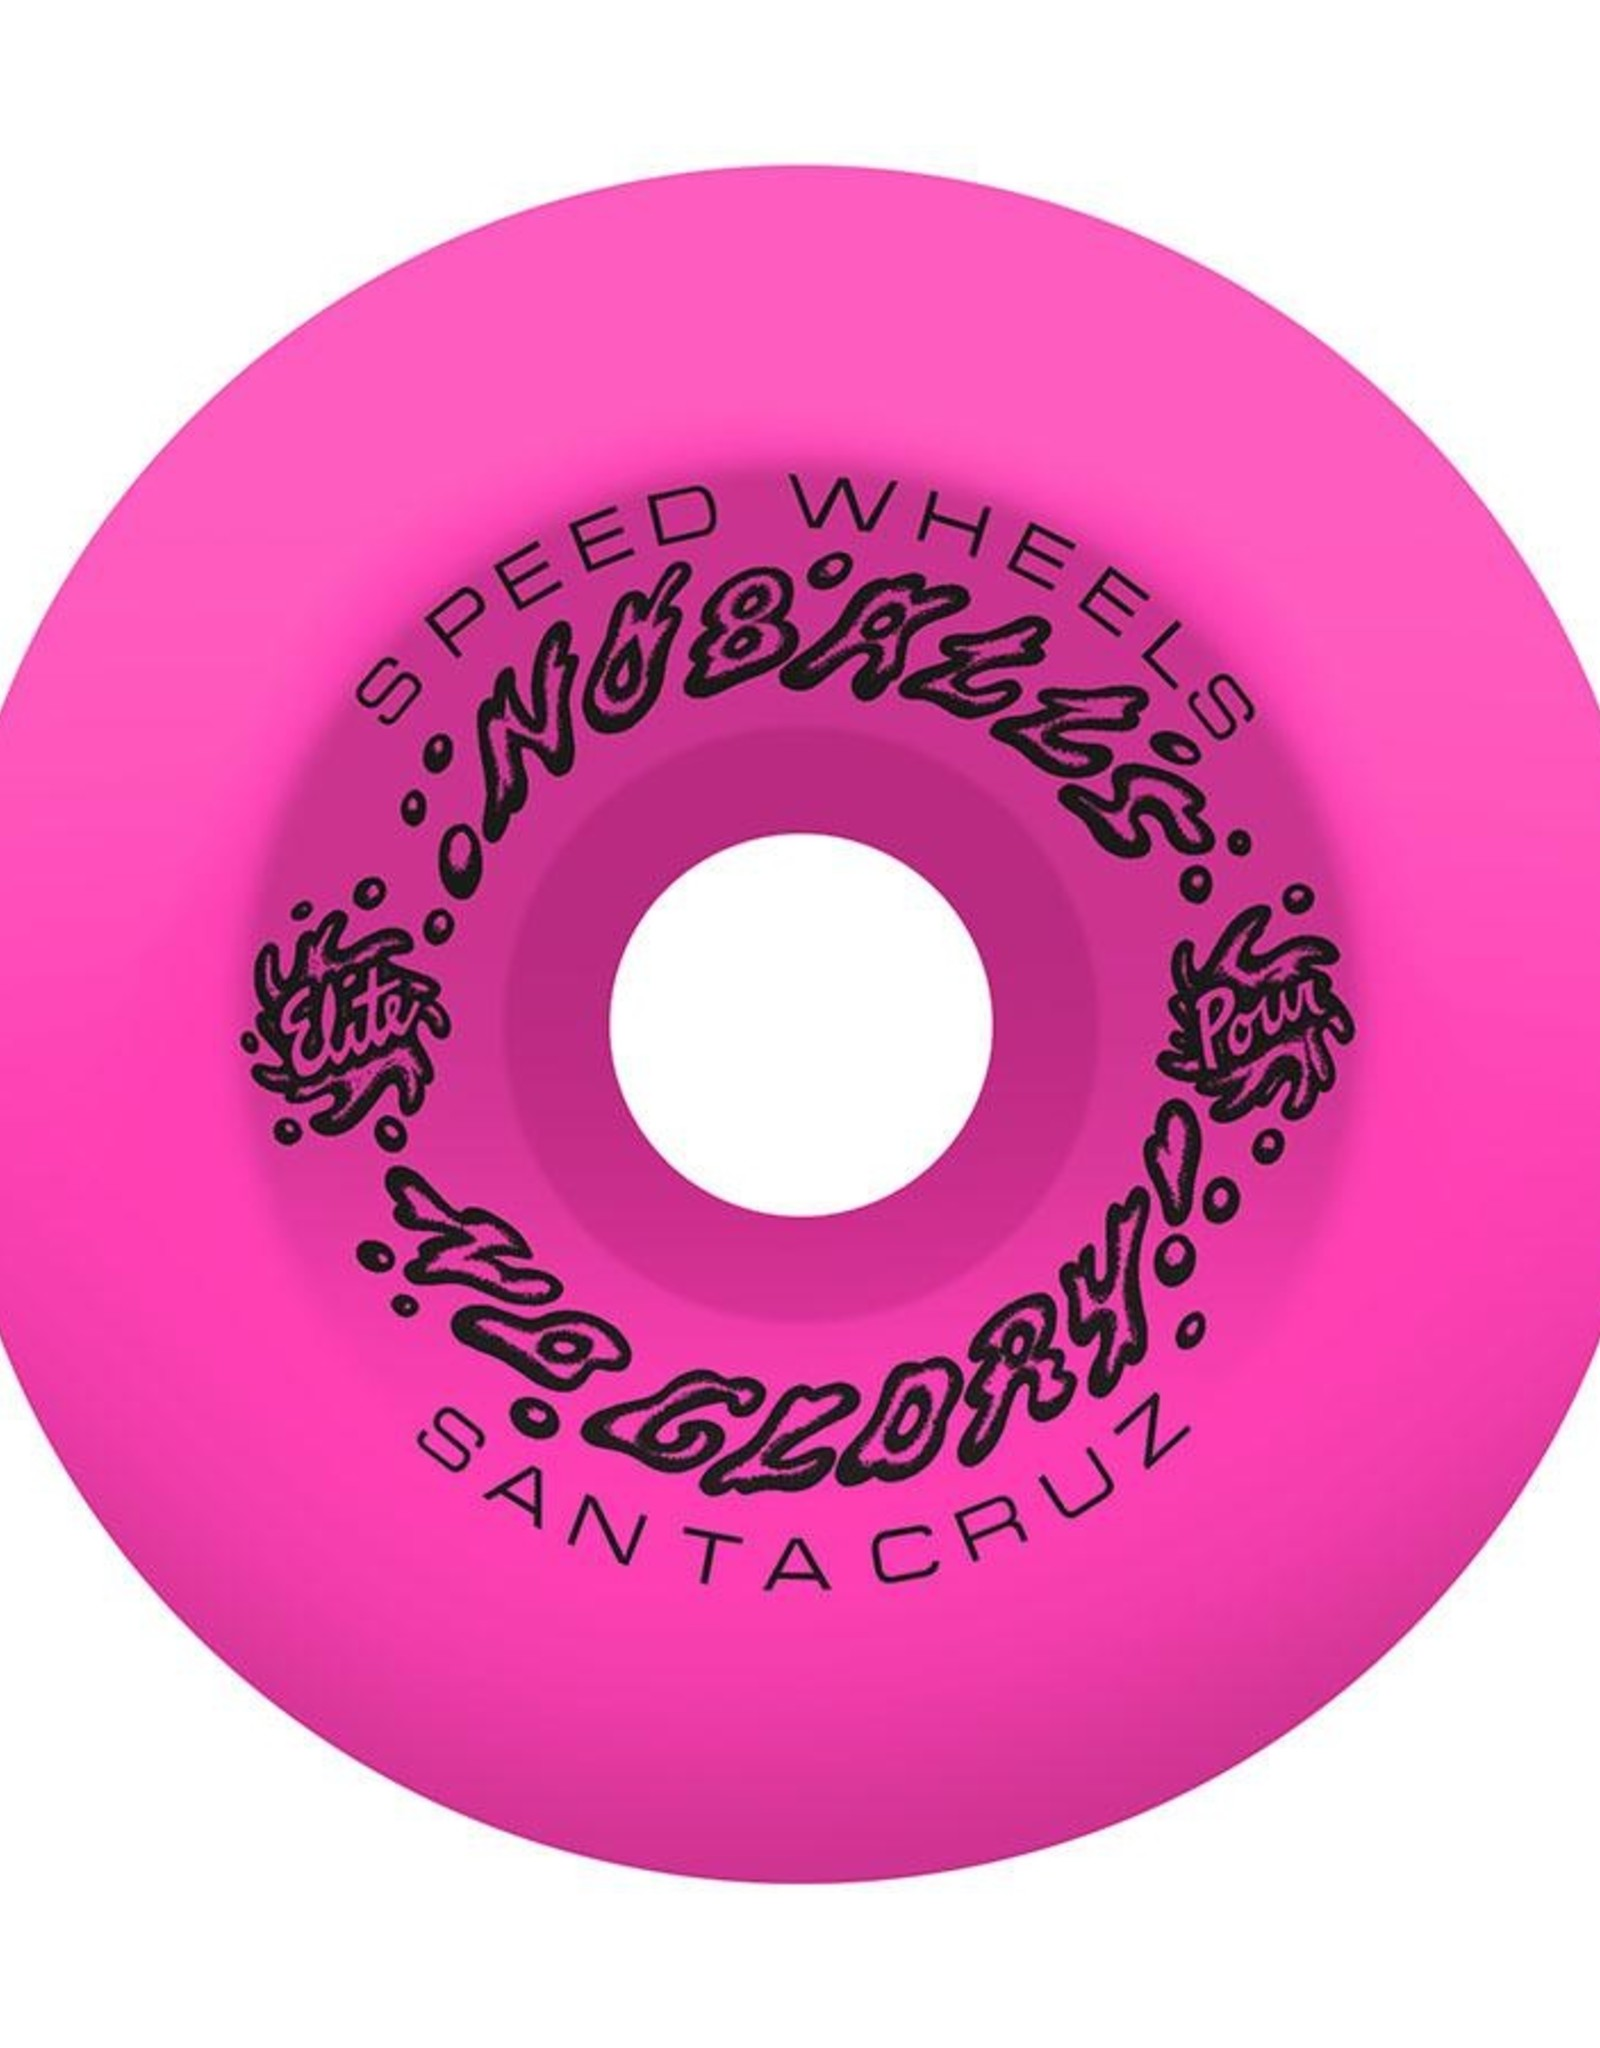 Slimeballs SLIME BALLS  SCUDWADS VOMITS NEON PINK 95A 60mm